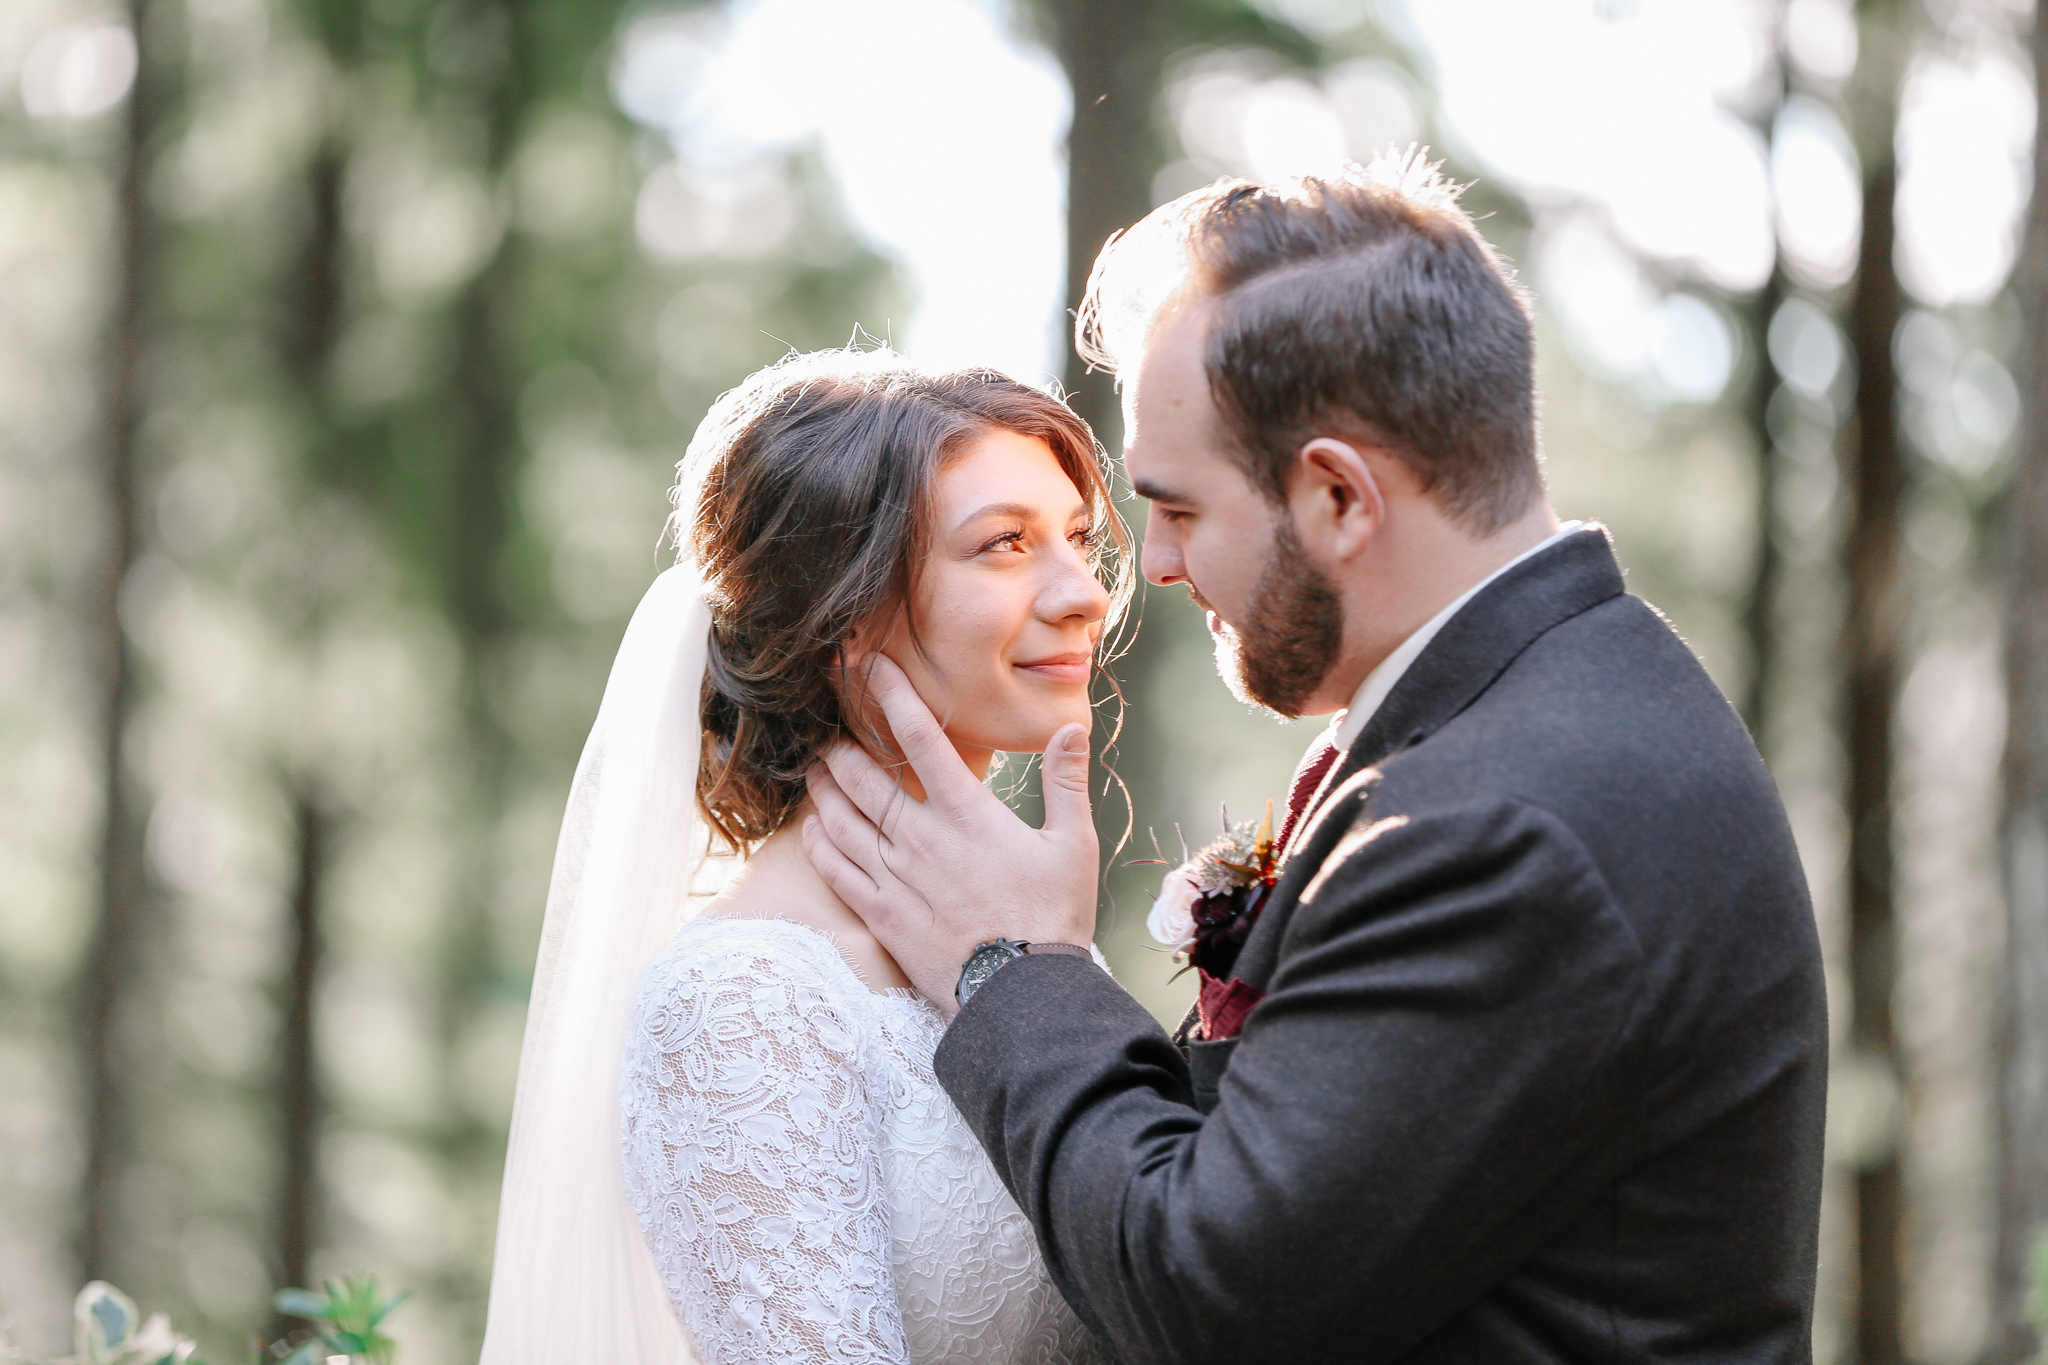 Manu and Laura - Portland Wedding Photographer - 33.jpg